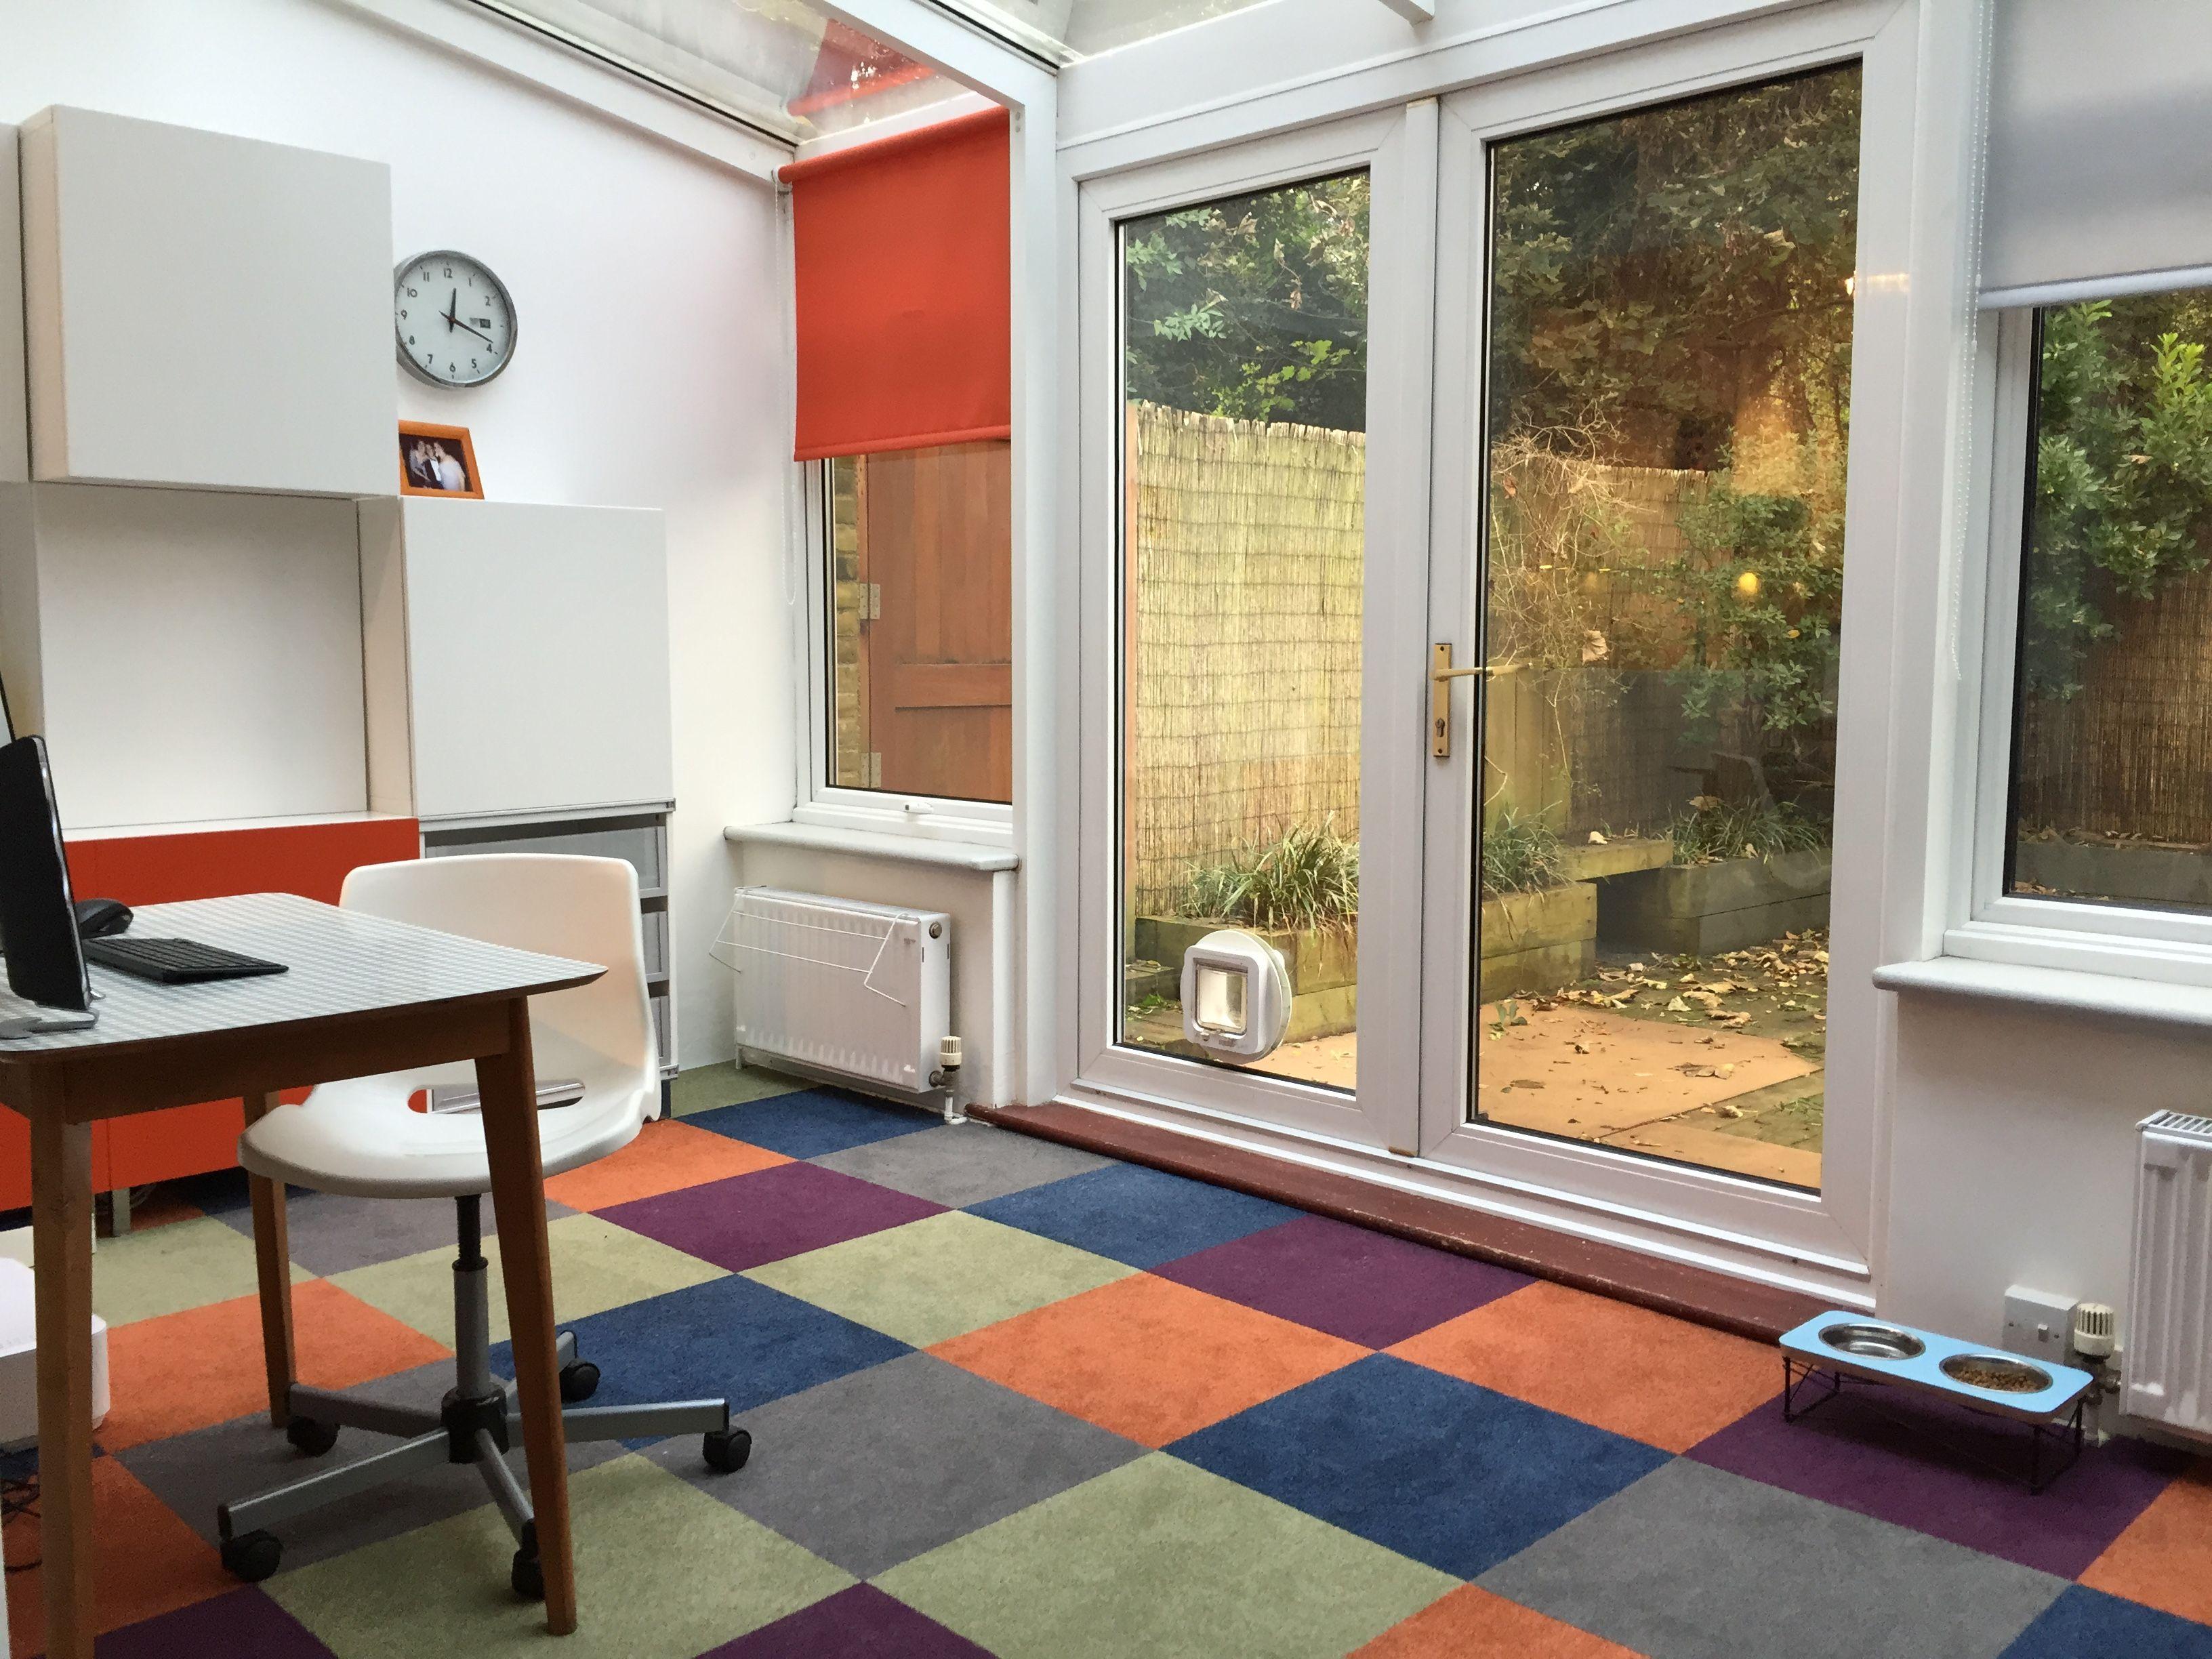 Garden carpet tiles carpet vidalondon the garden room ikea wall units b q carpet tiles blinds2go blinds baanklon Image collections